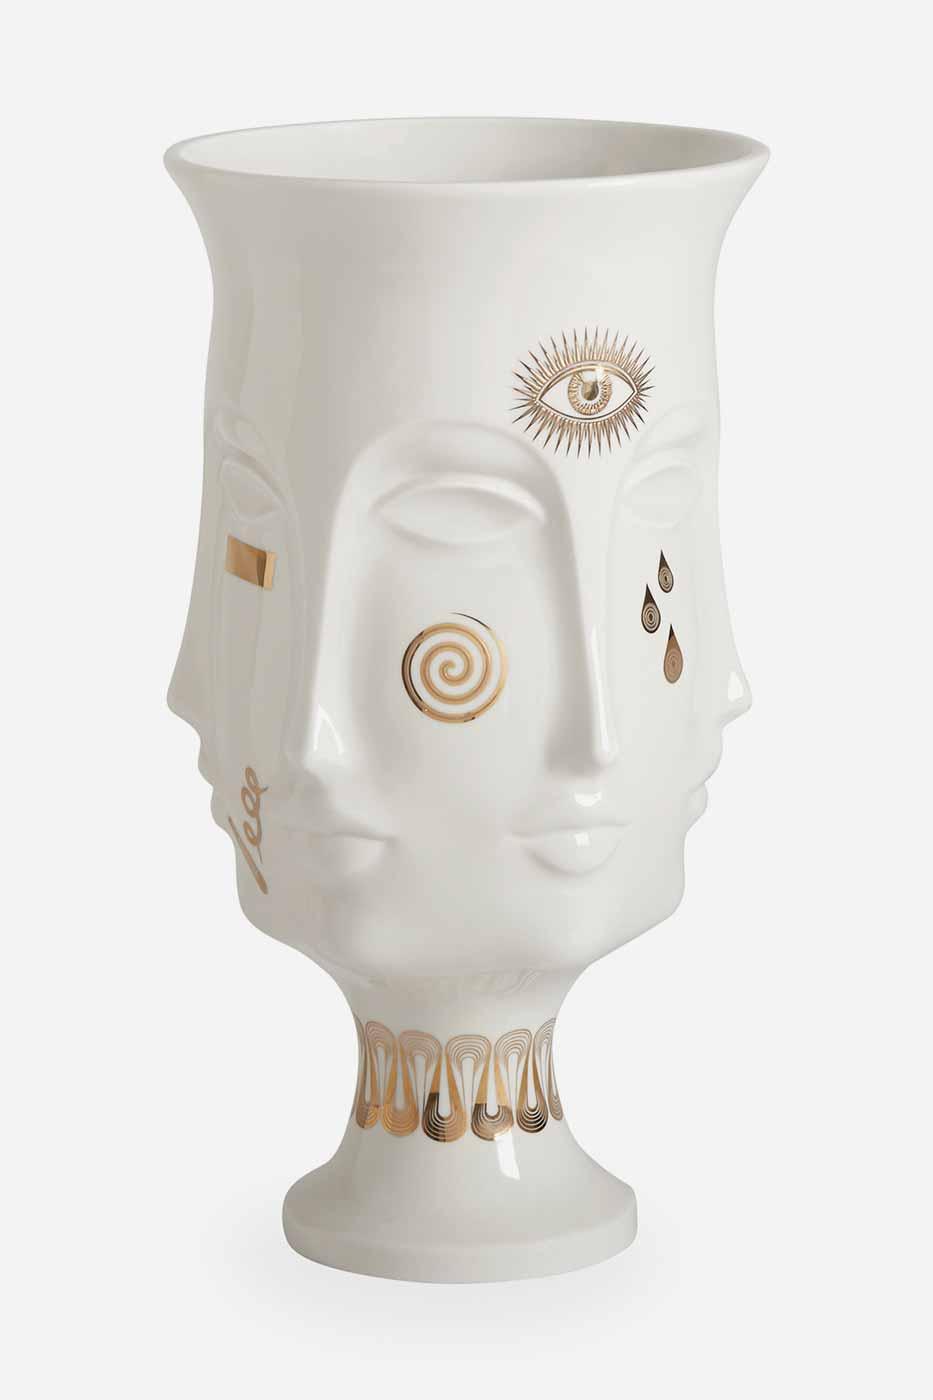 Vas Gilded Dora Maar 38 cm